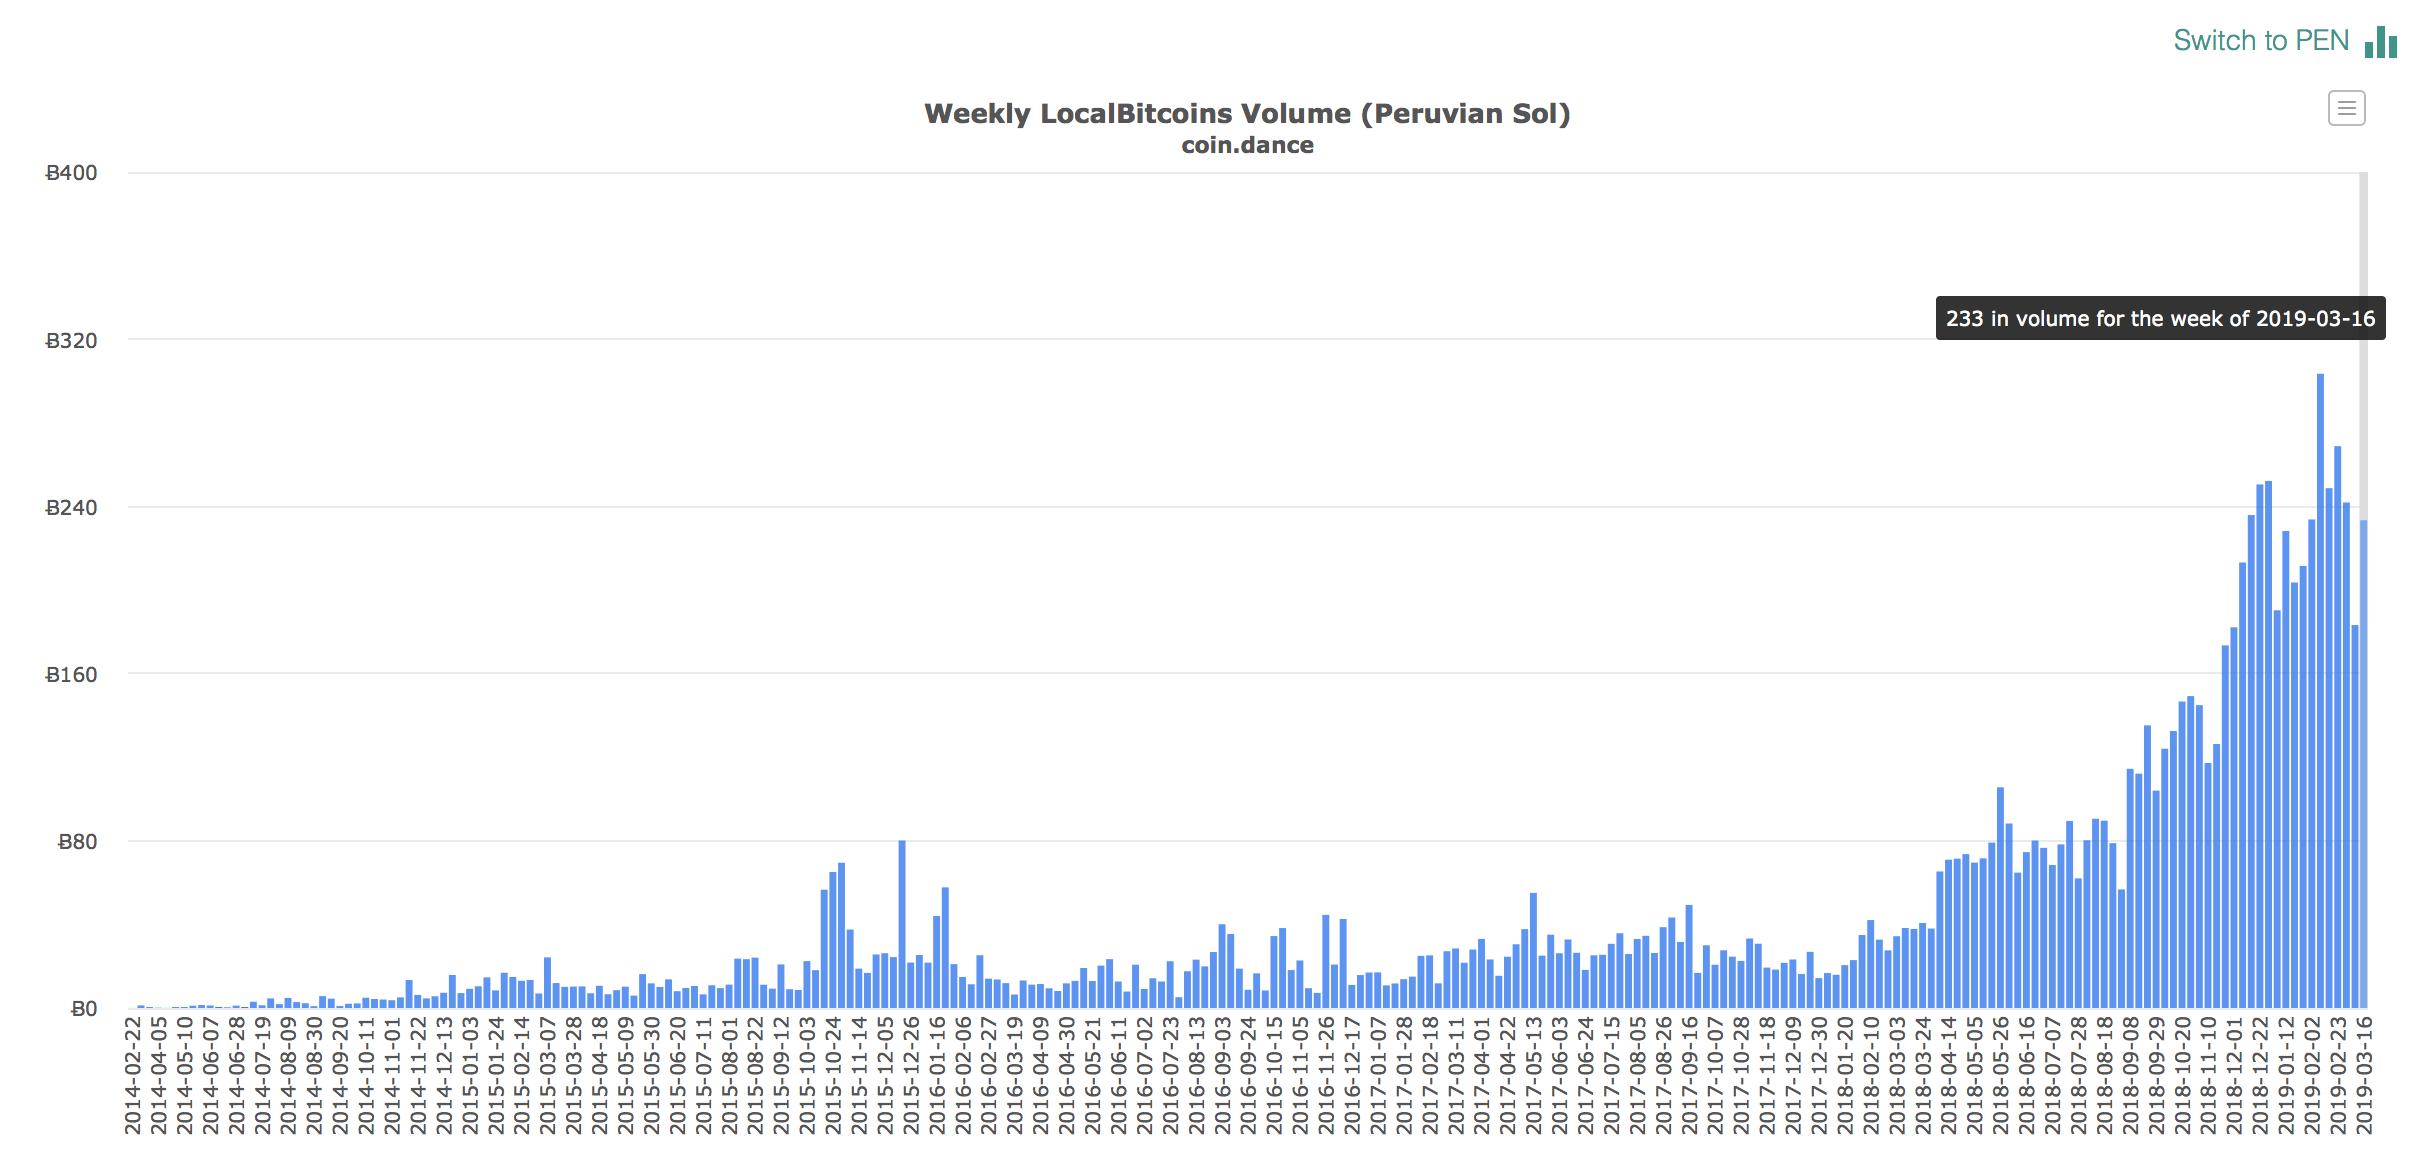 bitcoin-volumes-peru-march-2019.png (2420×1158)